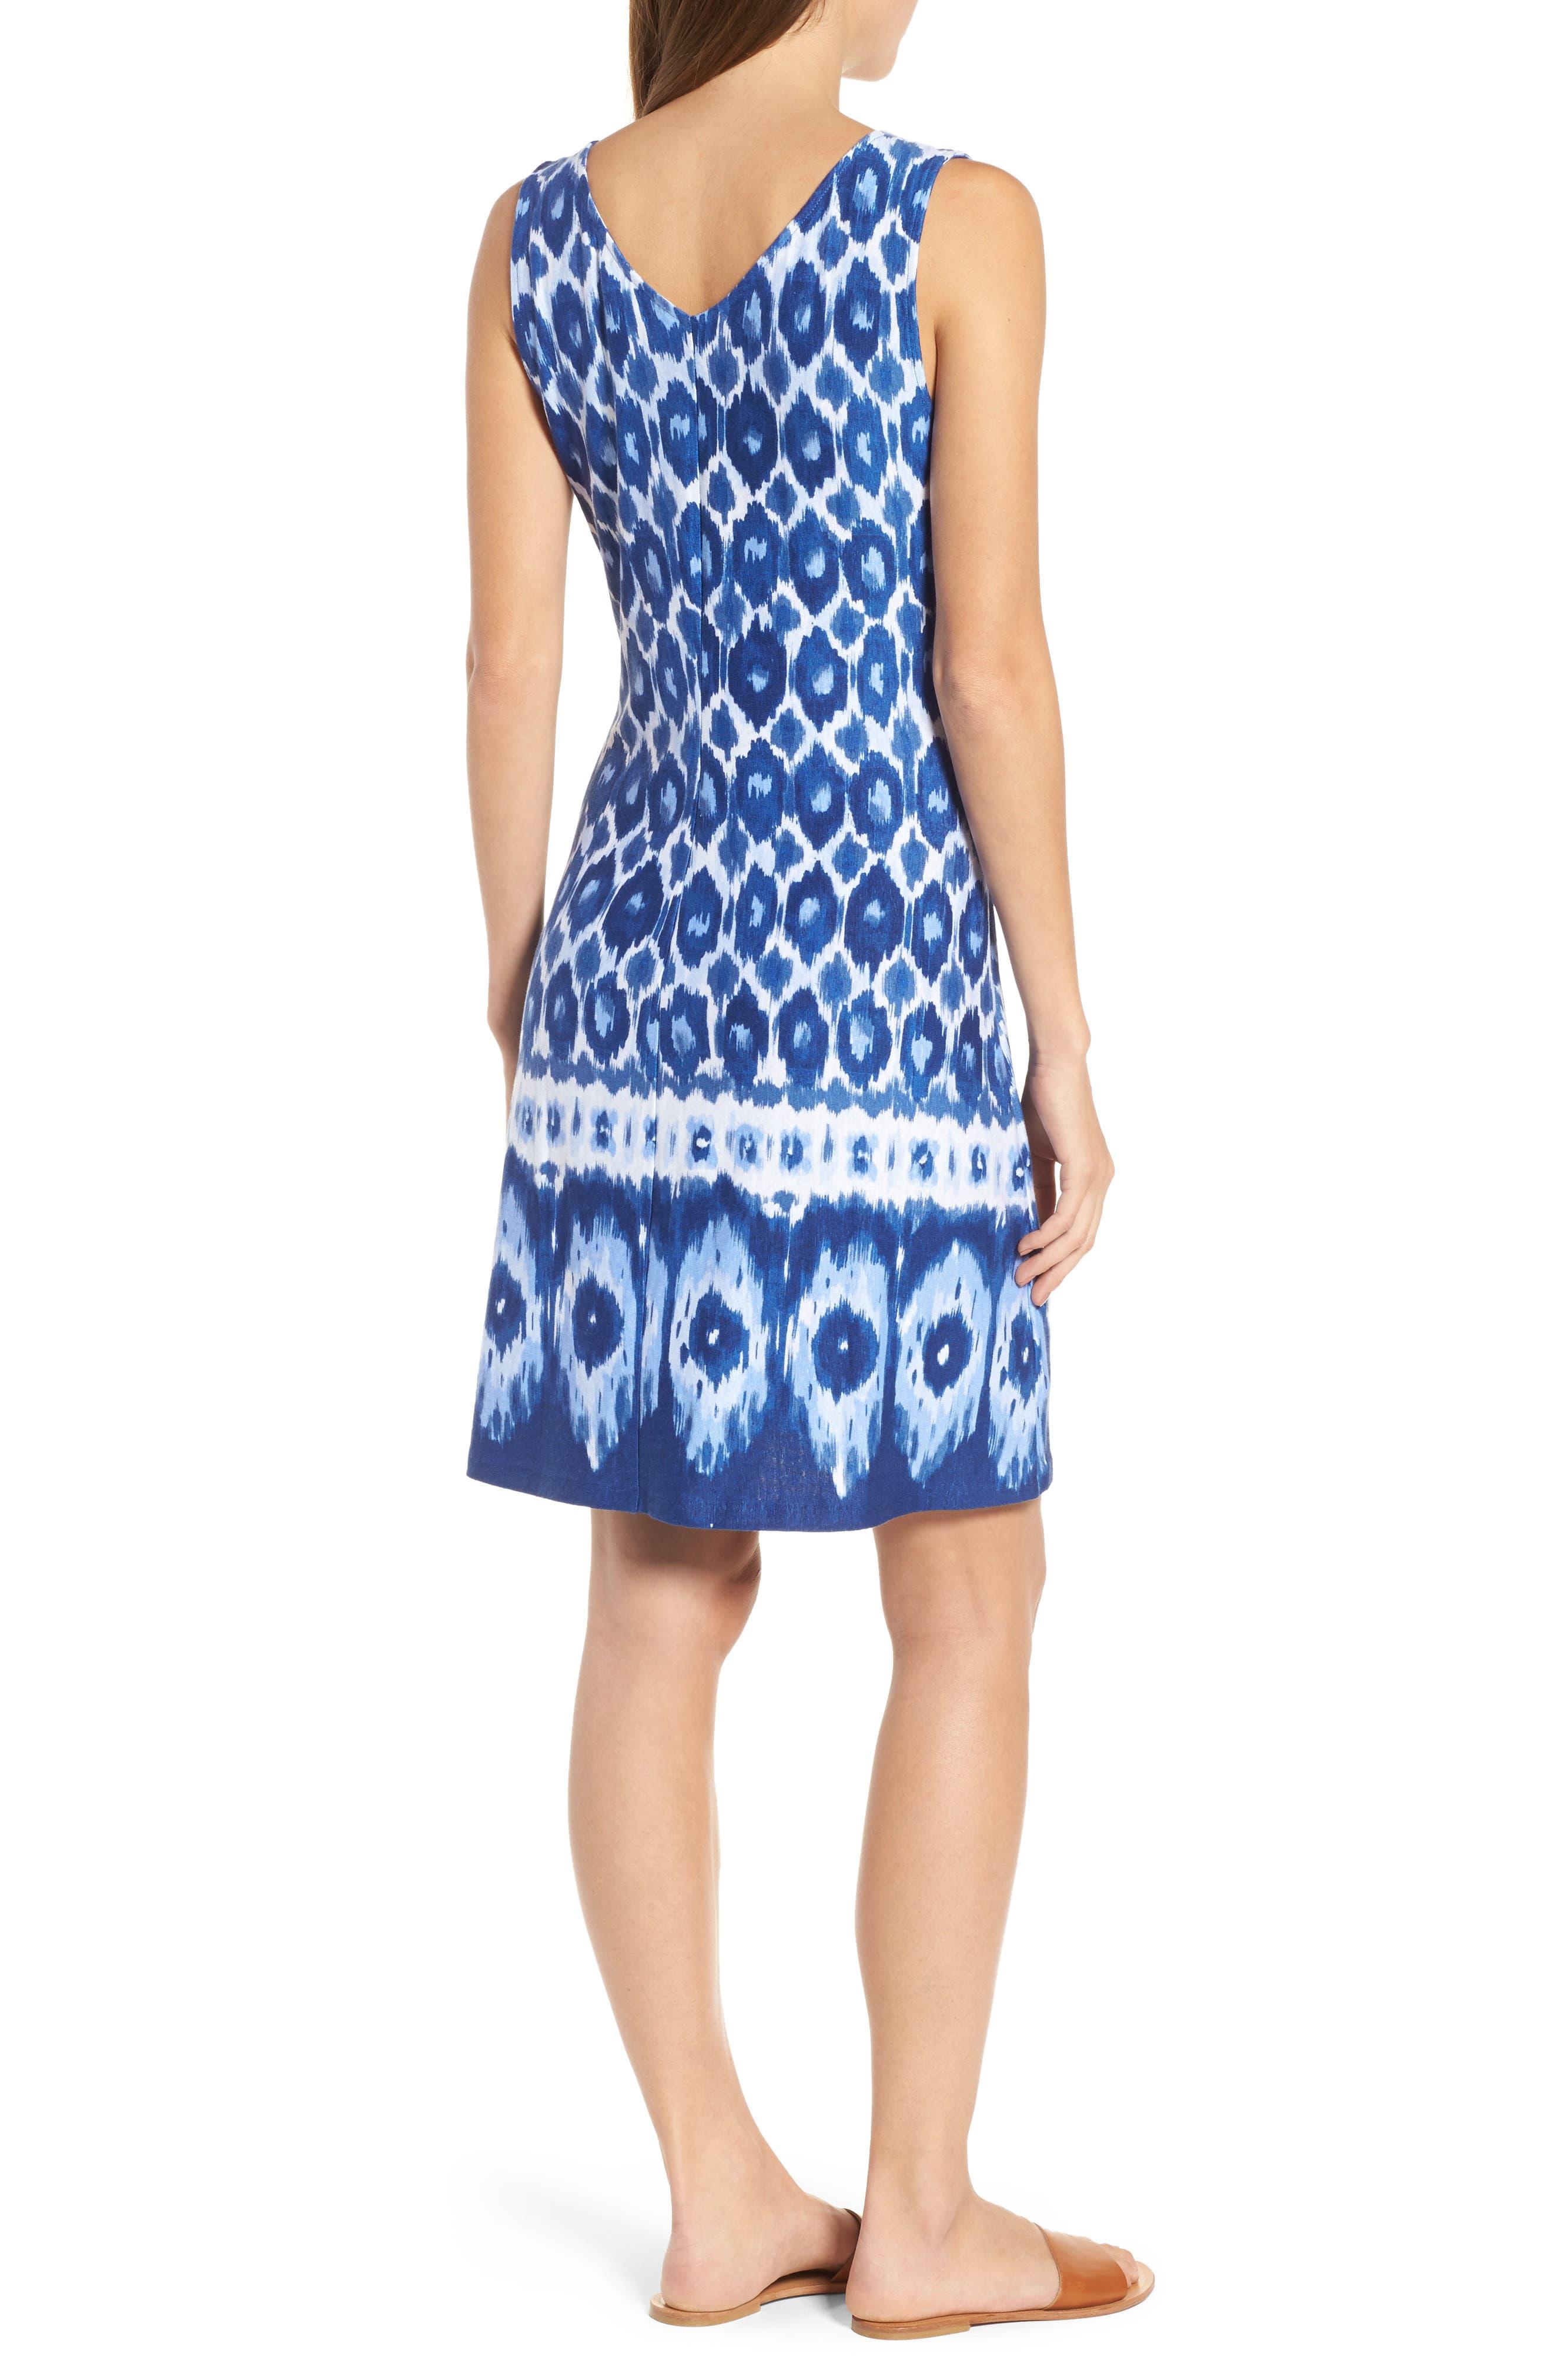 Innercoastal Ikat Sleeveless Dress,                             Alternate thumbnail 2, color,                             KINGDOM BLUE